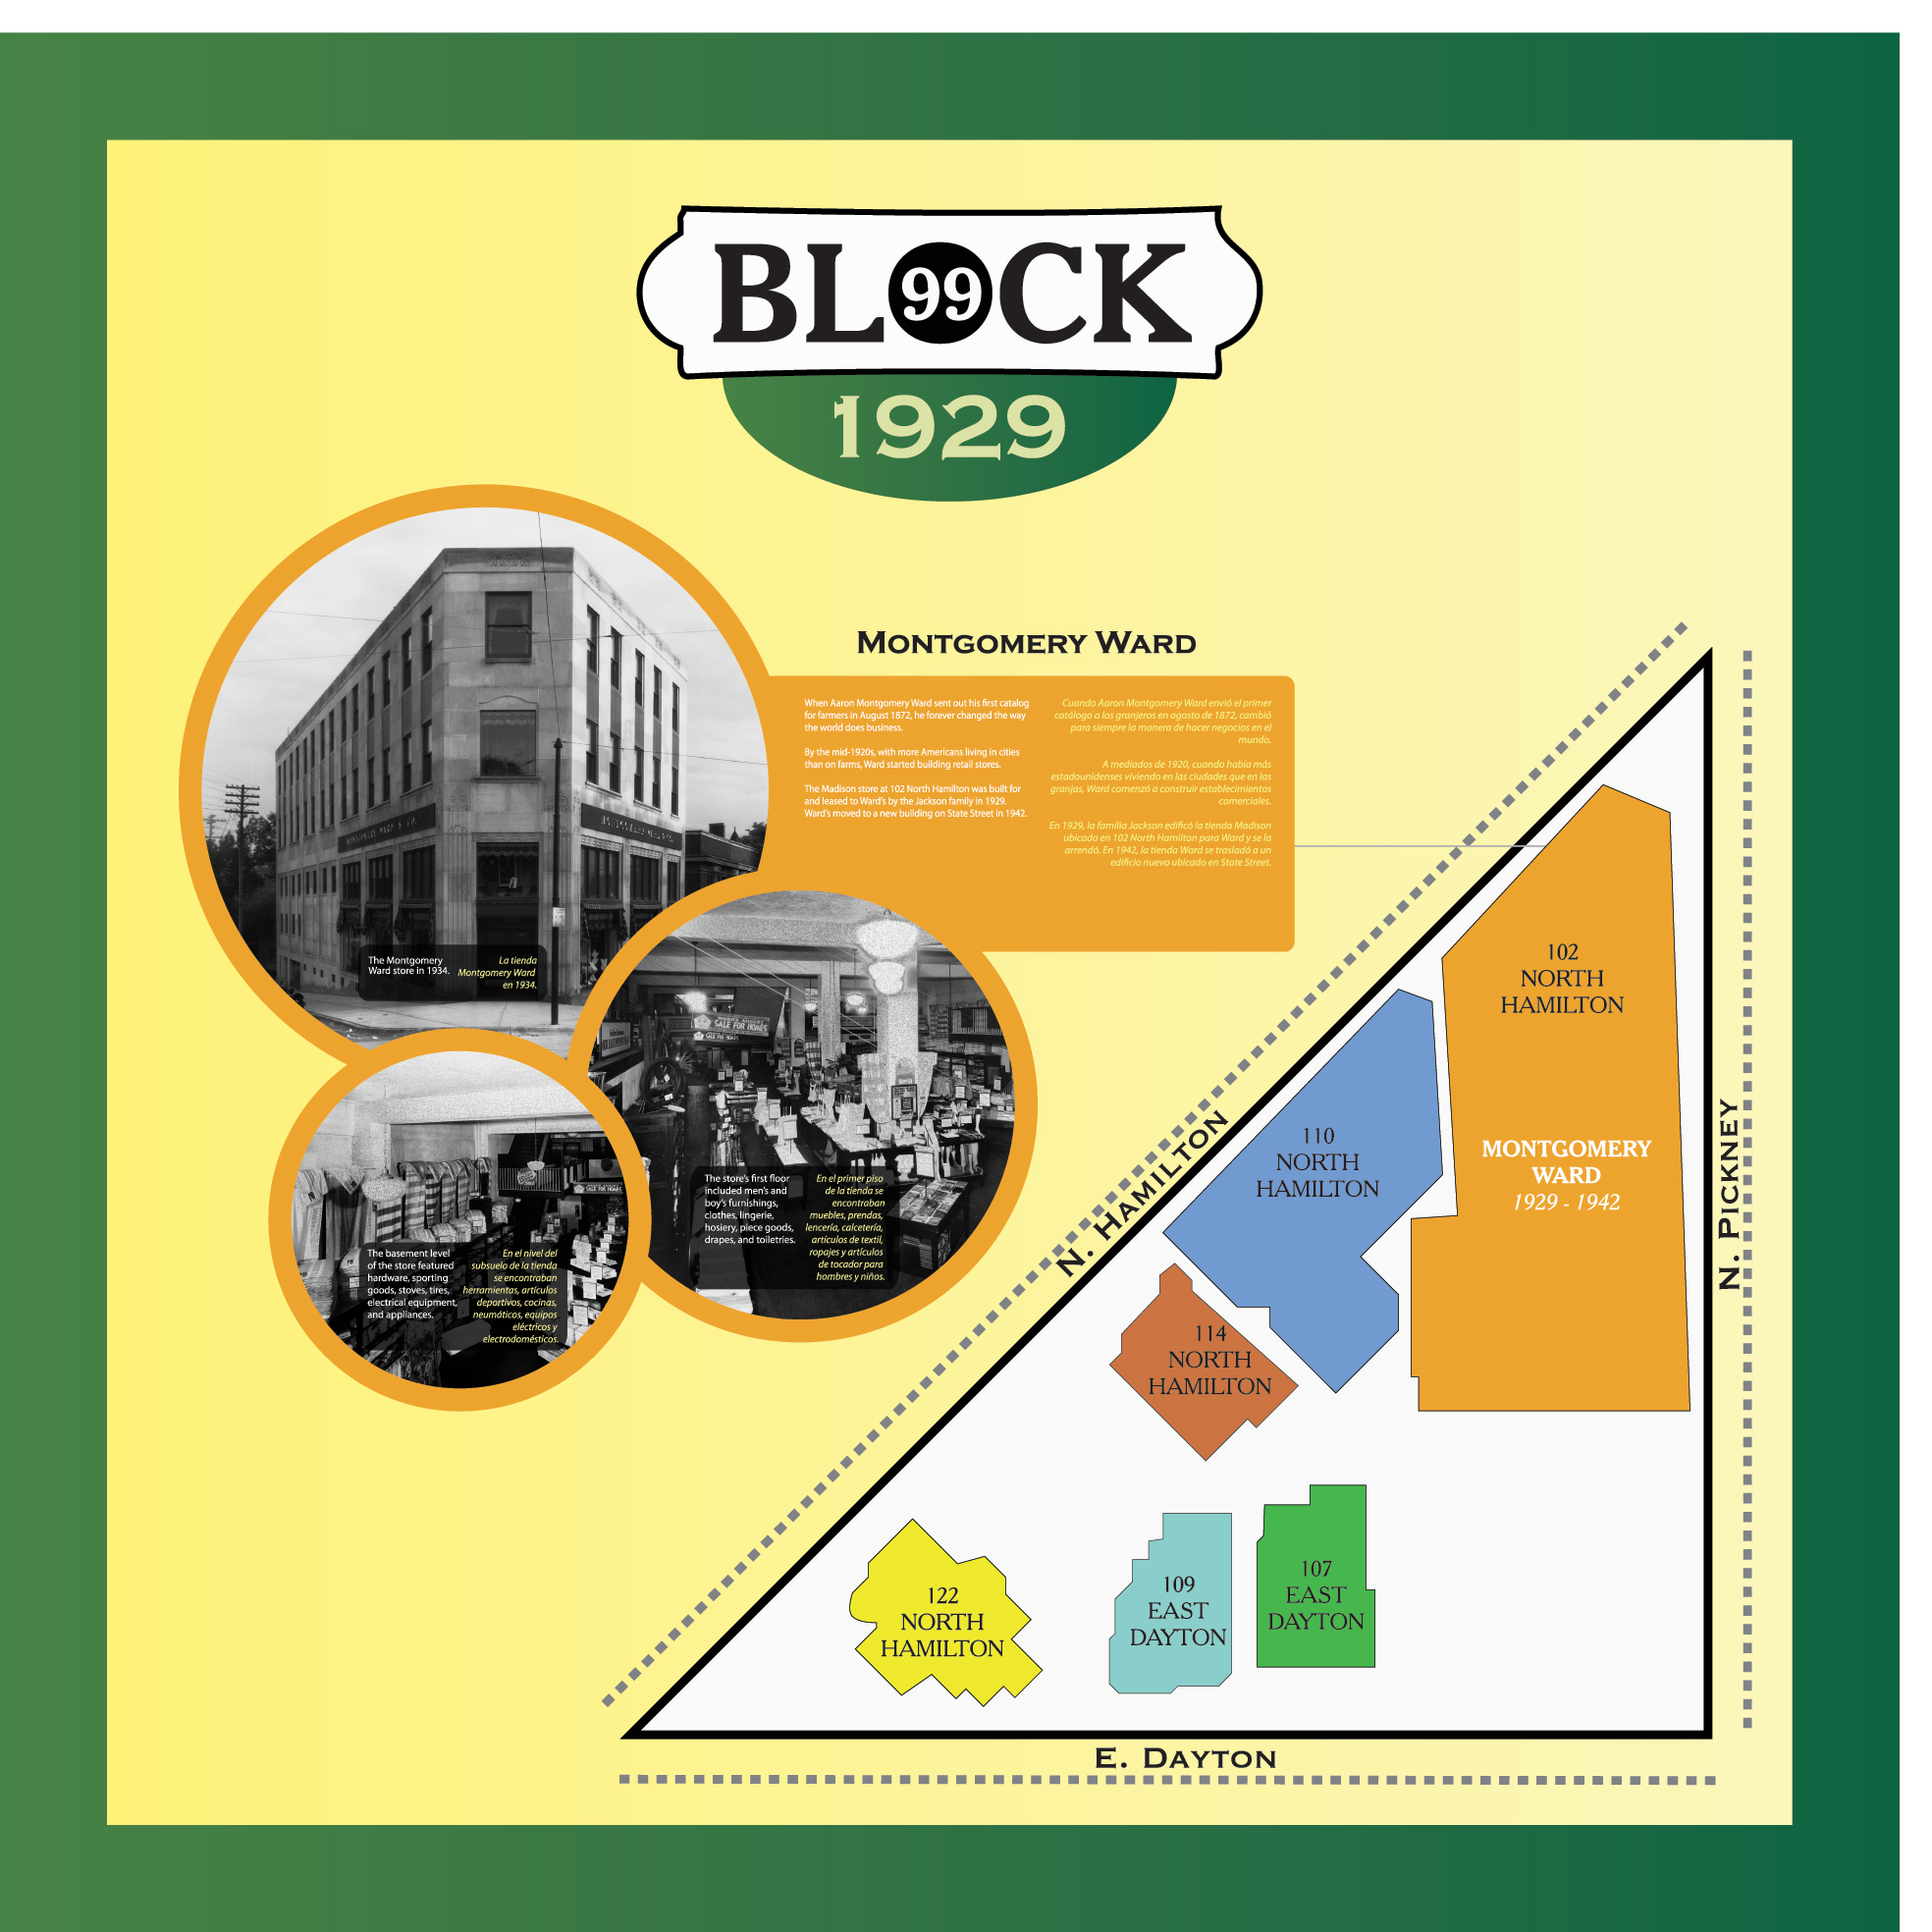 BLOCK_99_Panels_FINAL-DRAFT-UPDATE-panel4.jpg